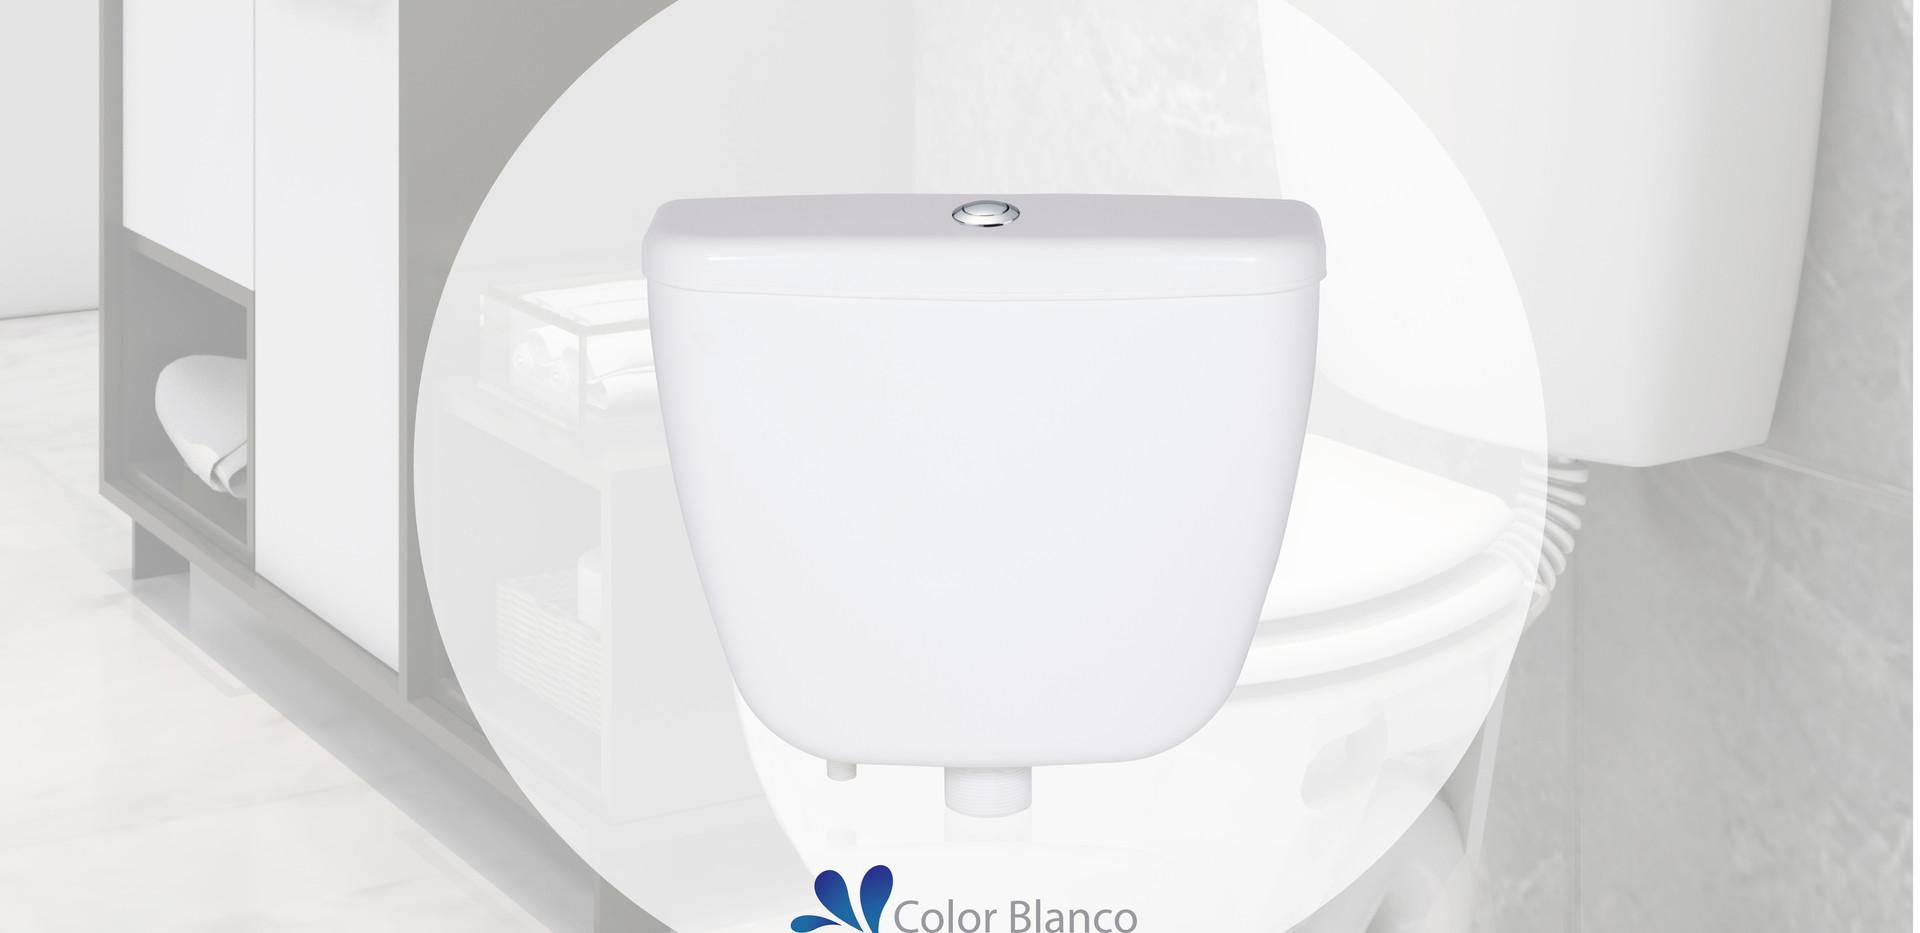 Mochila luxury blanca